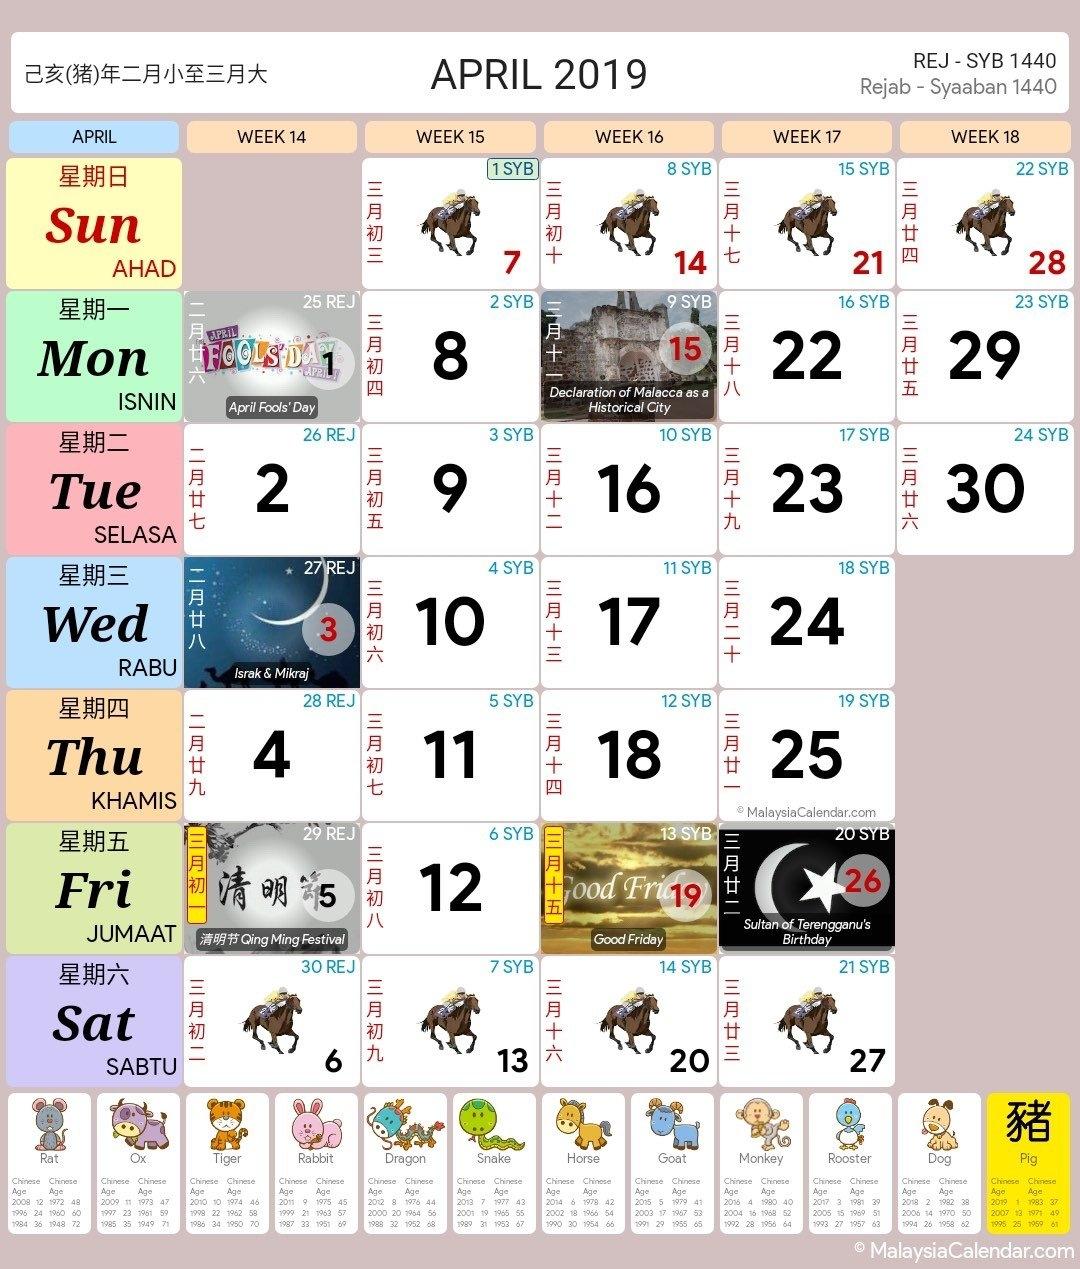 Malaysia Calendar Year 2019 (School Holiday) - Malaysia Calendar Calendar Year 2019 Malaysia